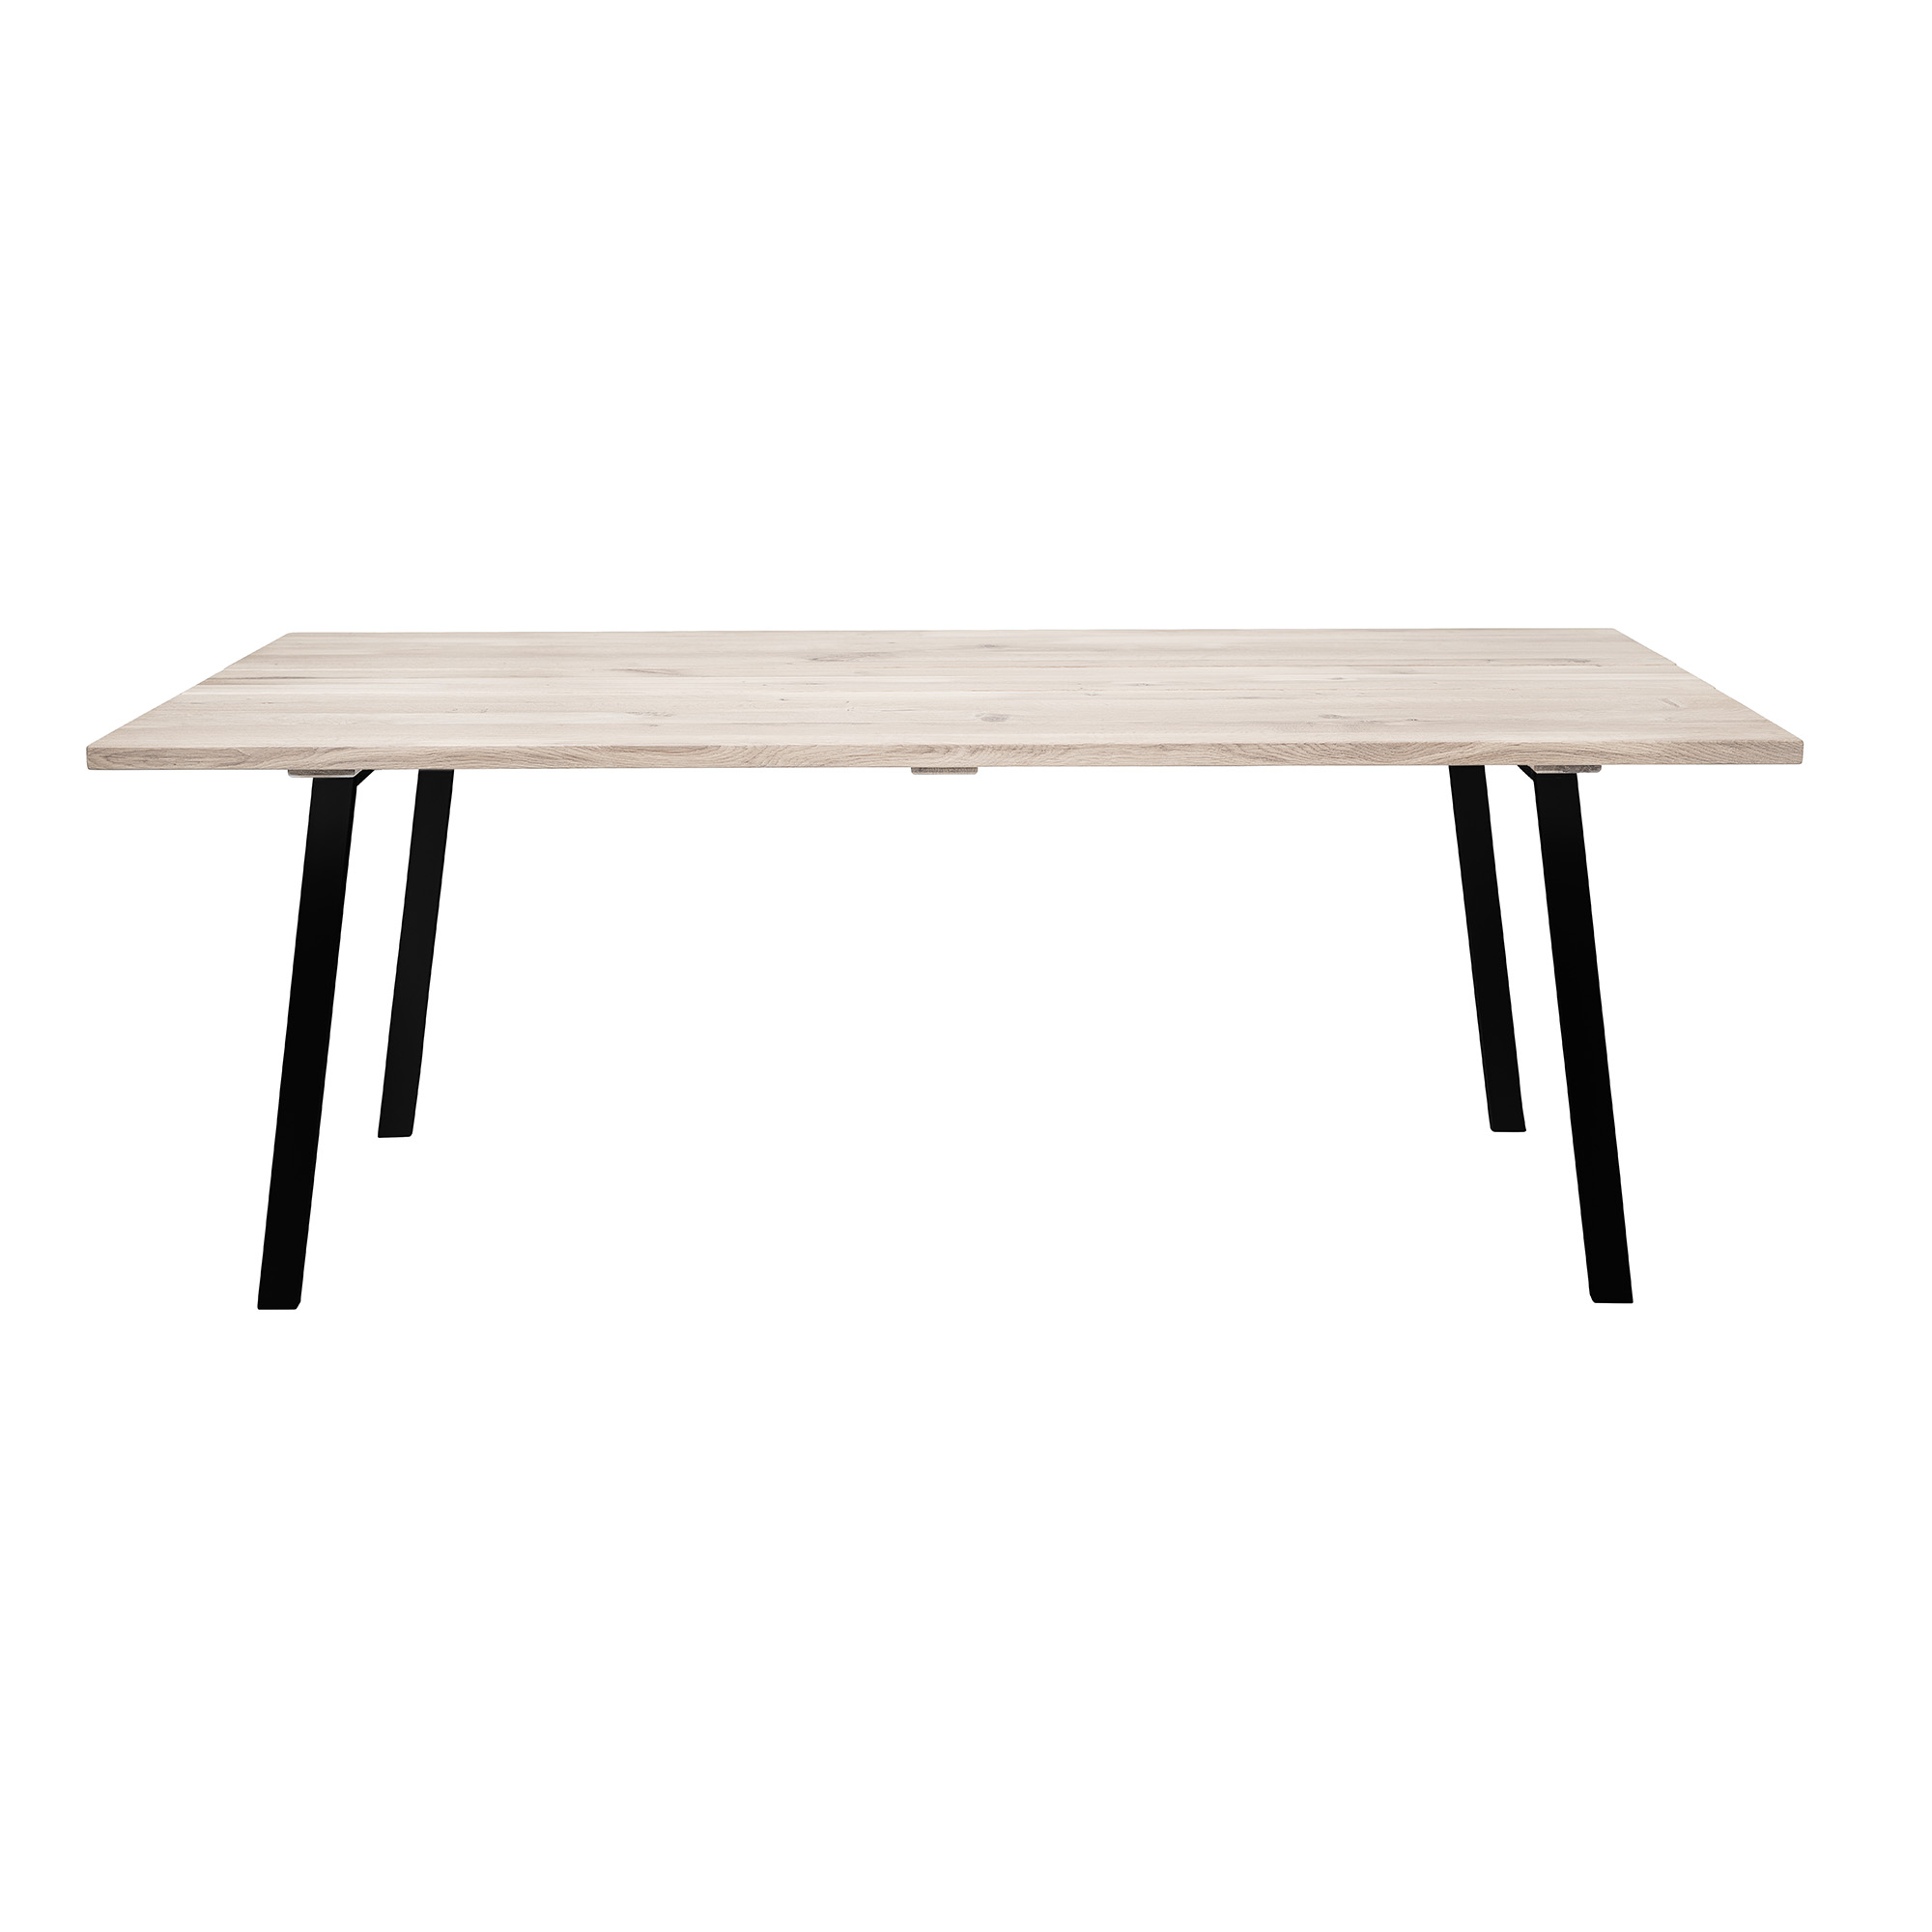 COZY matbord ek/ svart 200 cm, Bloomingville